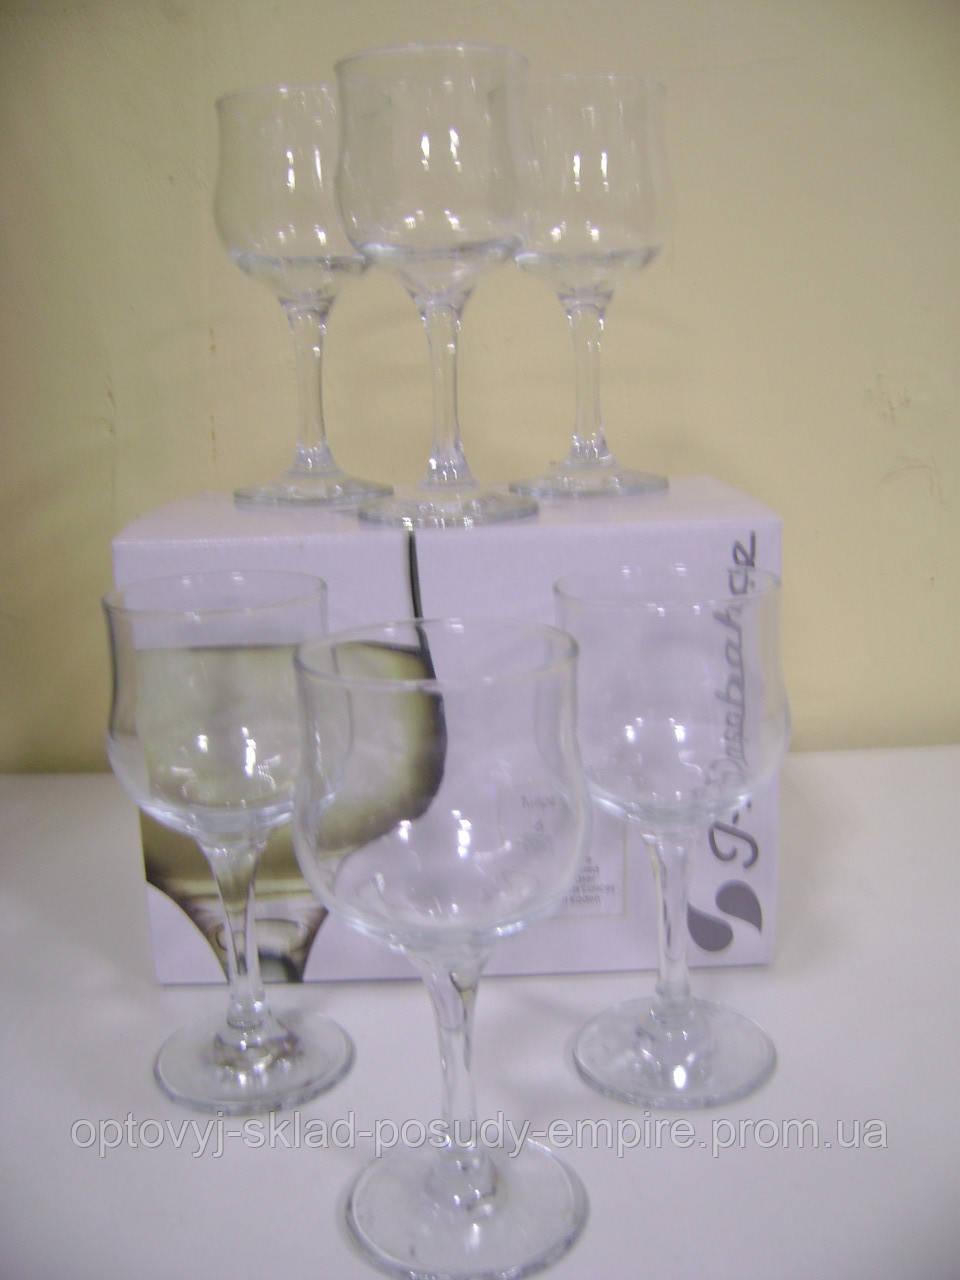 44167 Тулип набор фужеров для вина  200 гр 6 шт